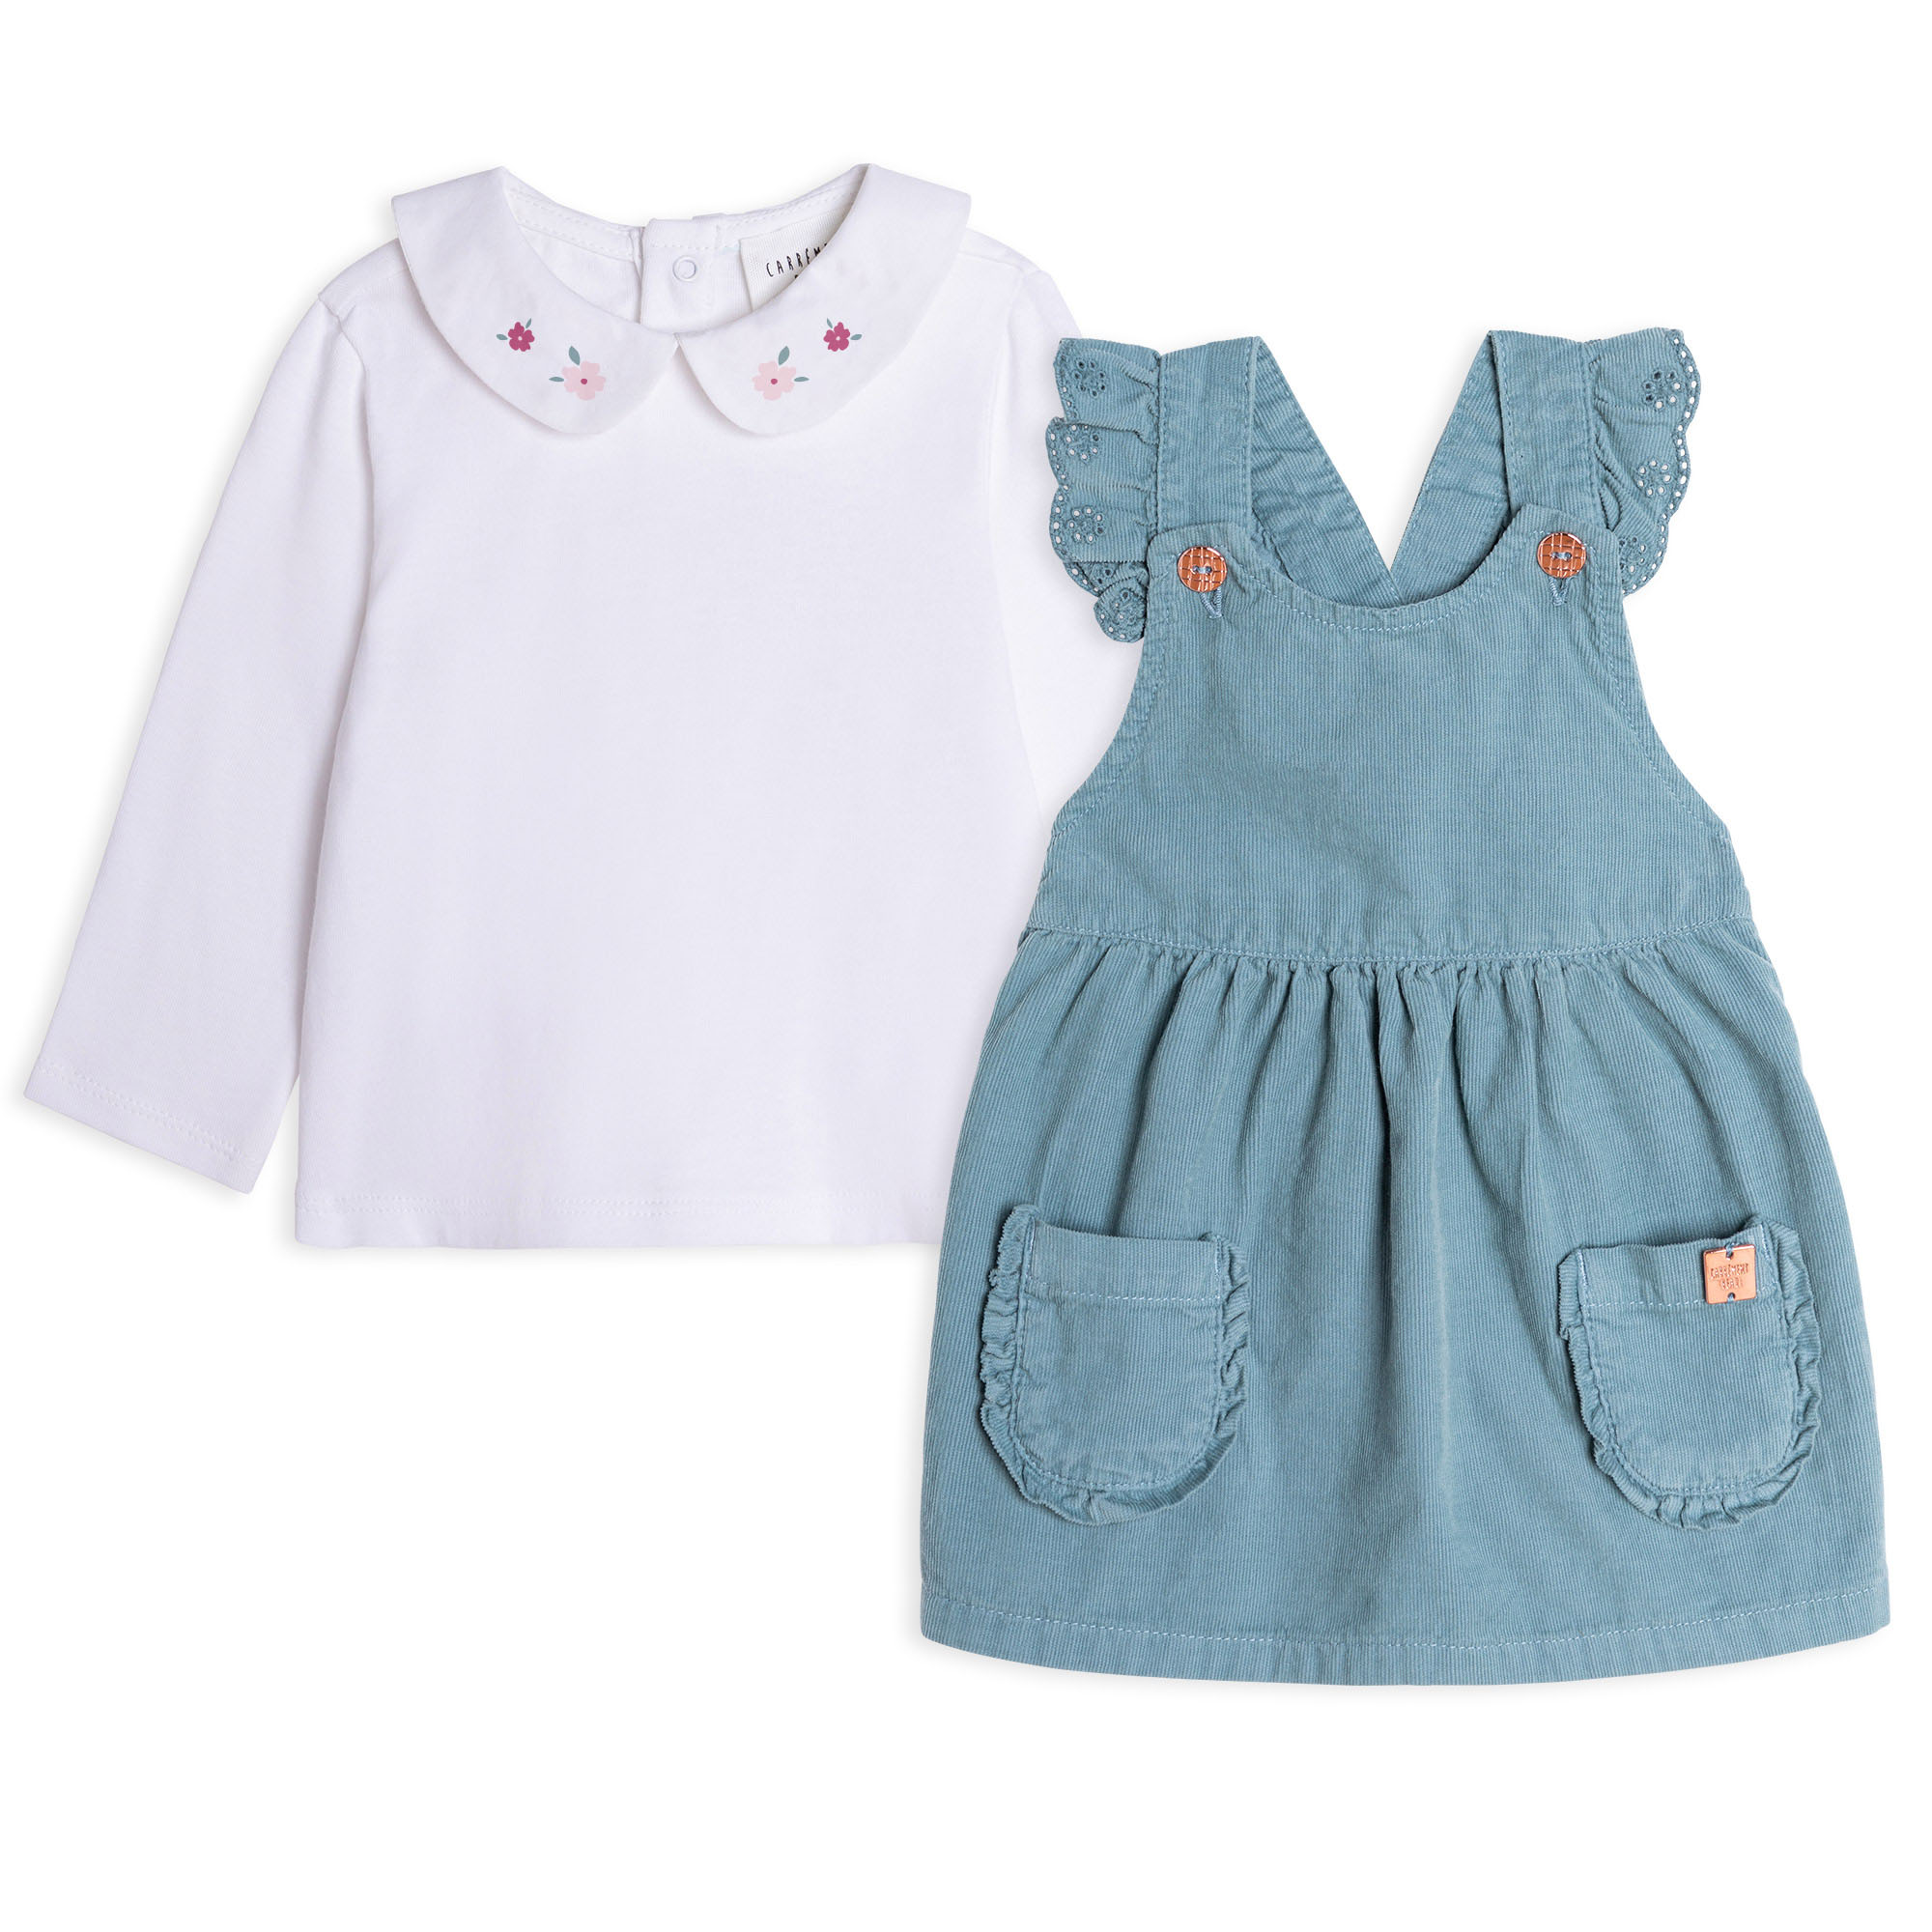 DRESS+T-SHIRT SET CARREMENT BEAU for GIRL